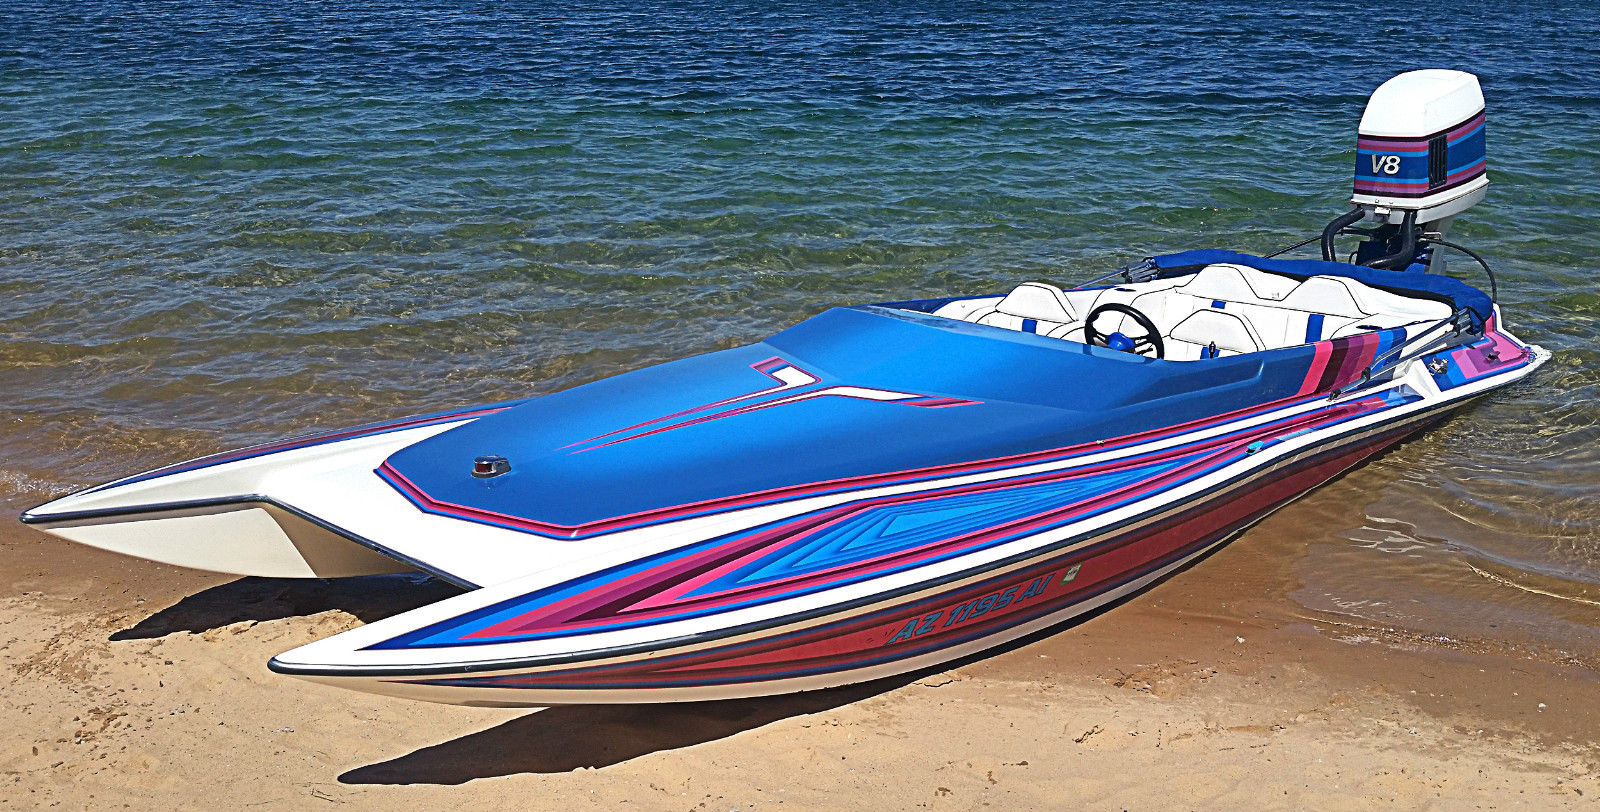 Daytona 21 - Slightly bigger yet still low slung, copied many times, popular for racing.